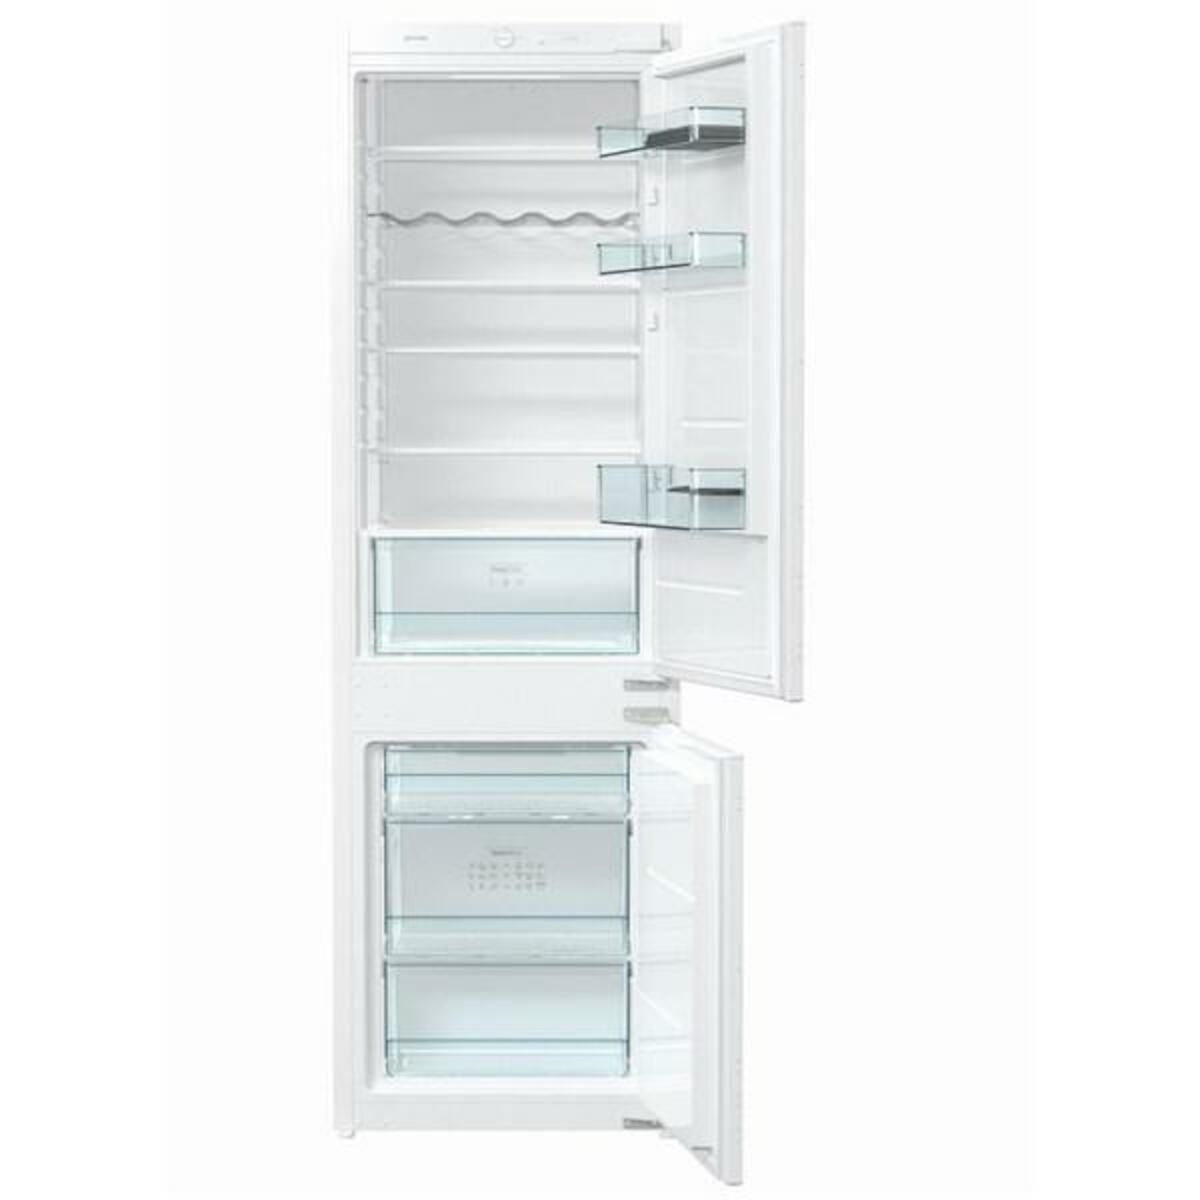 Vstavaná chladnička Gorenje RKI4182E1